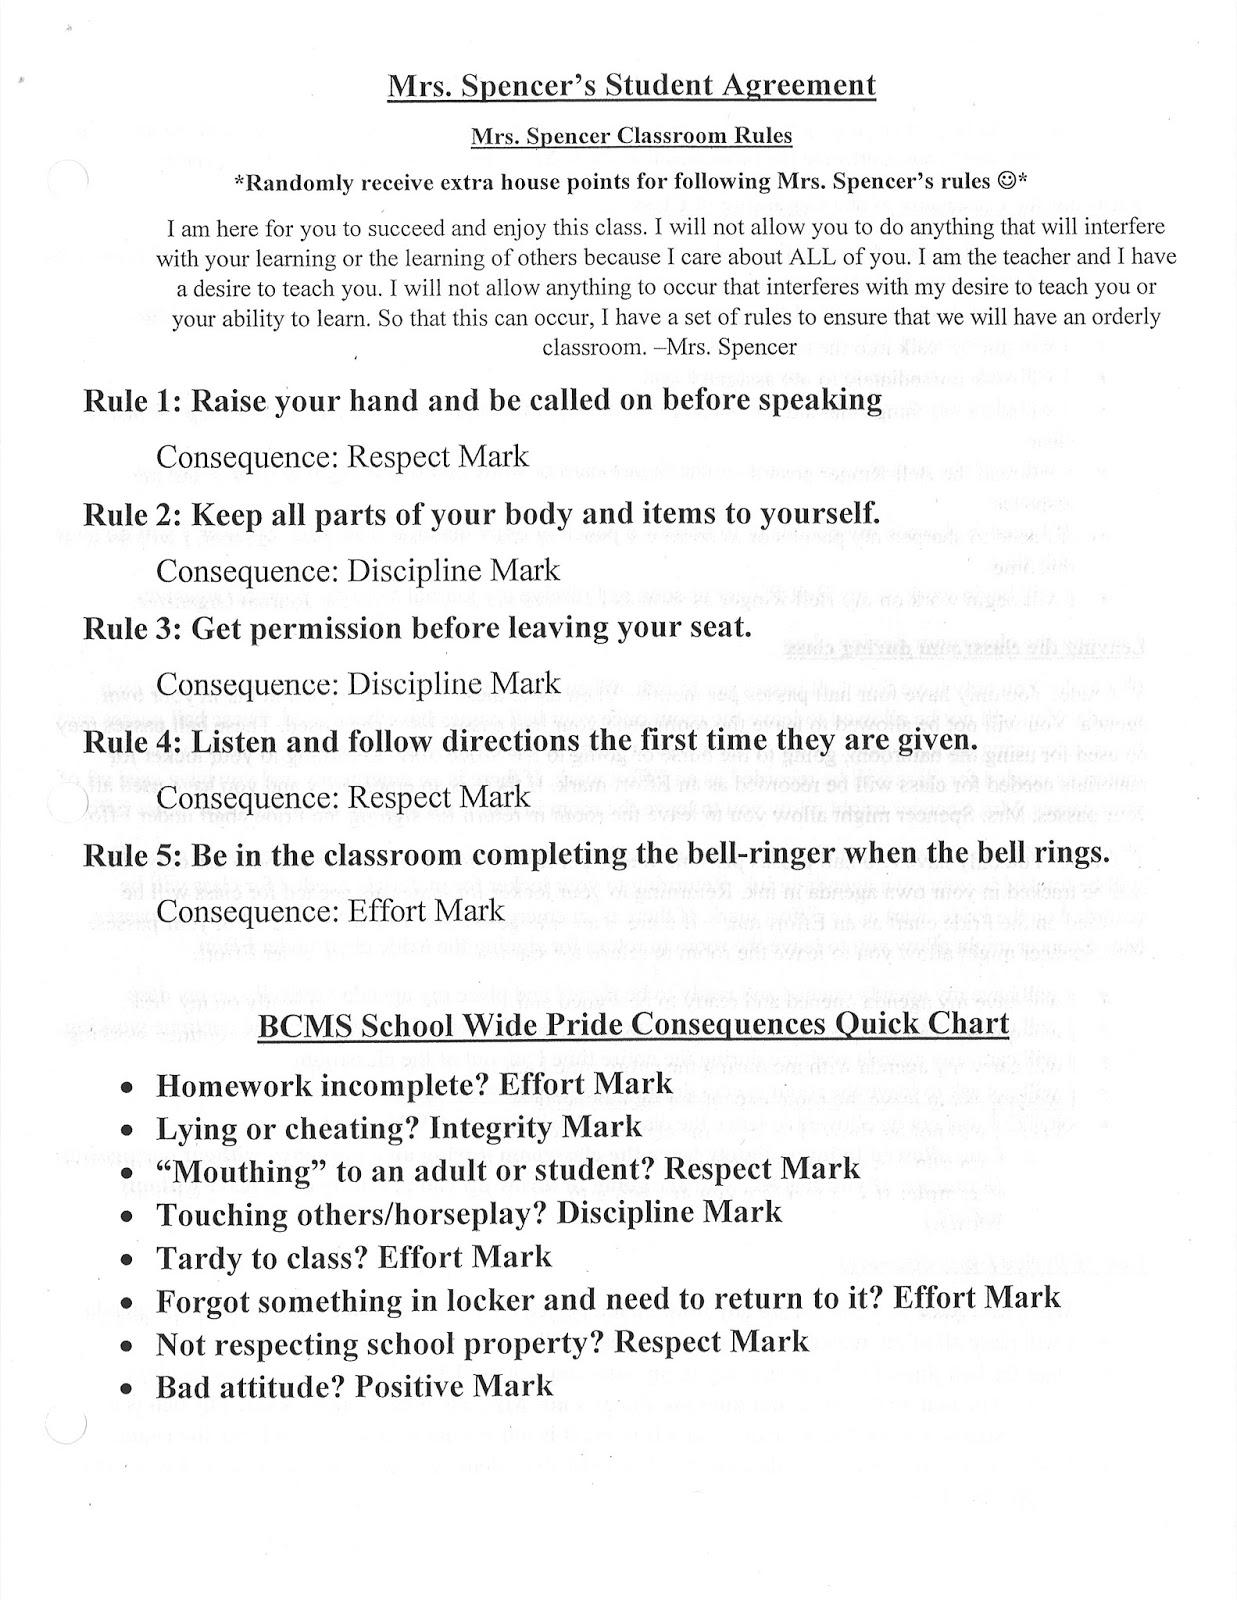 Bcms 6th Grade Social Studies Mrs Spencers Student Agreement